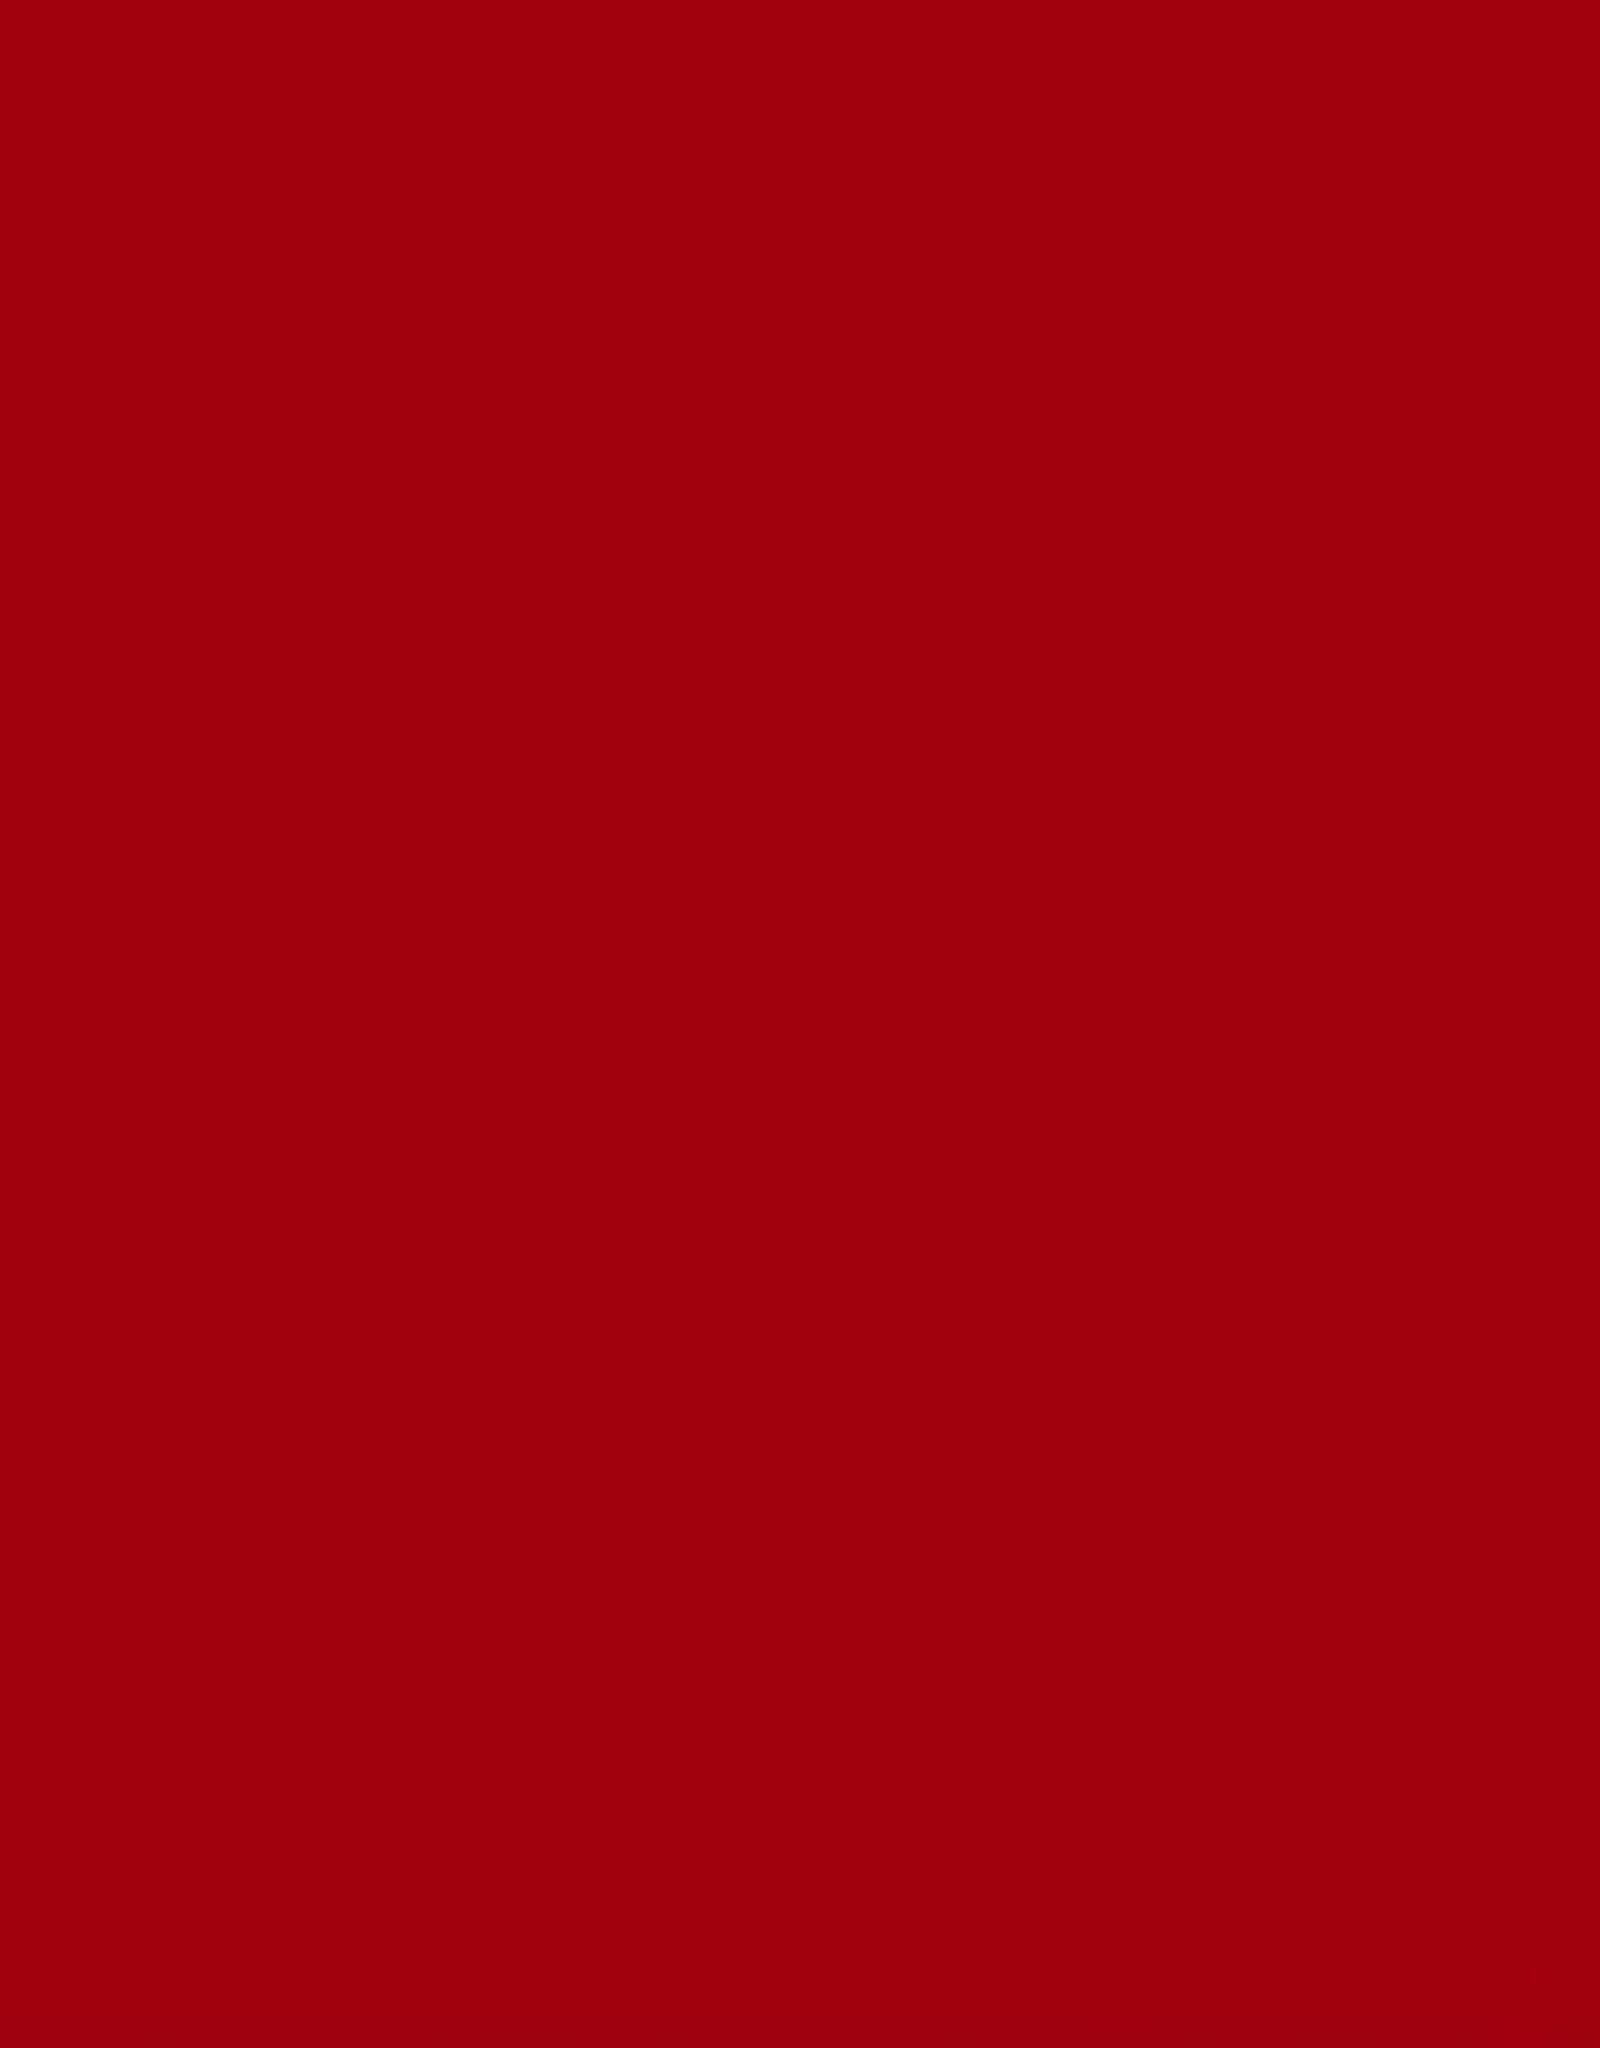 intercoat Vinyl mat donker rood 3837 - INTERCOAT